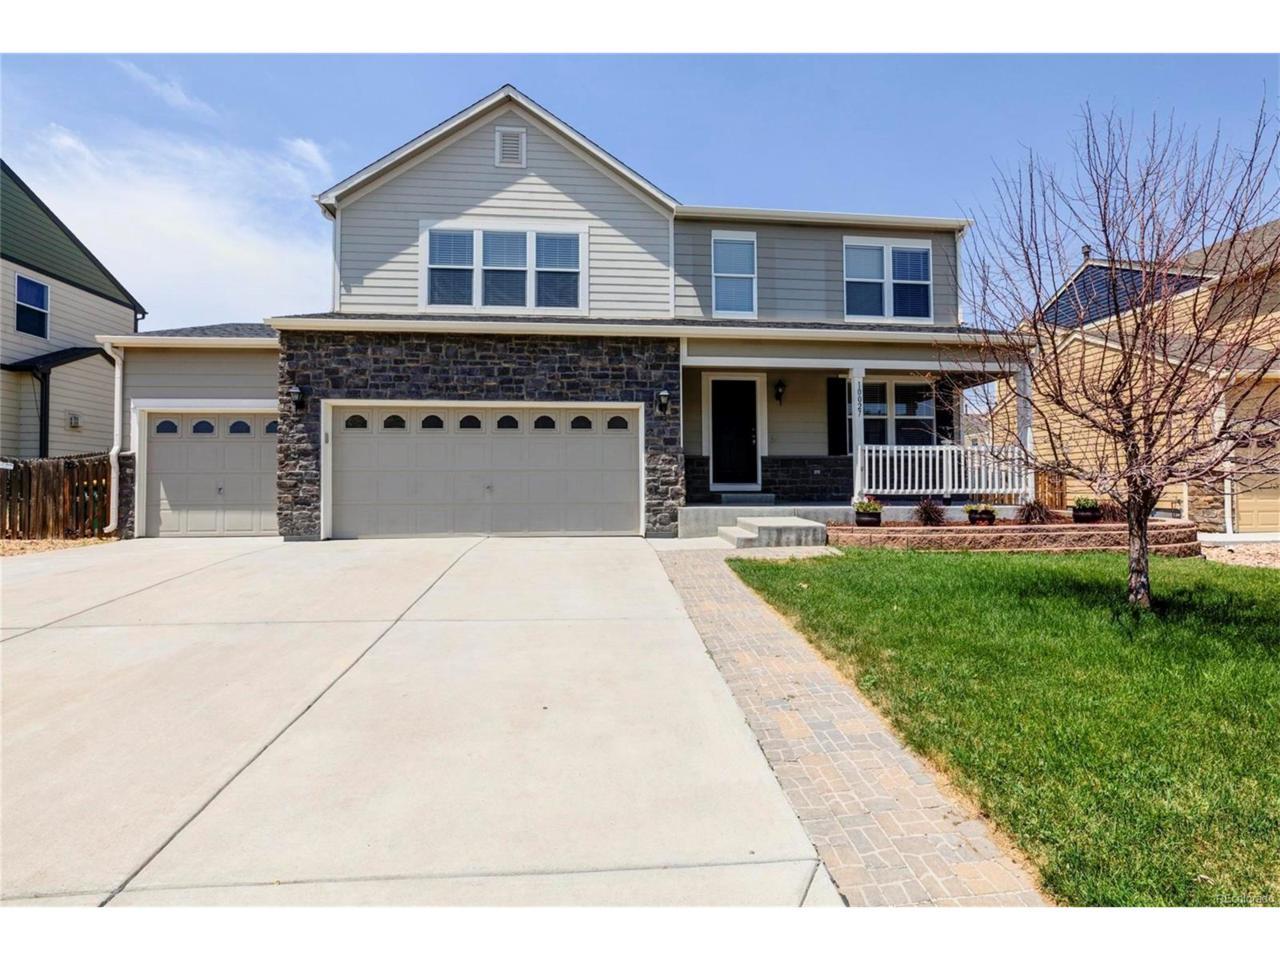 10027 Granby Street, Commerce City, CO 80022 (MLS #3120398) :: 8z Real Estate